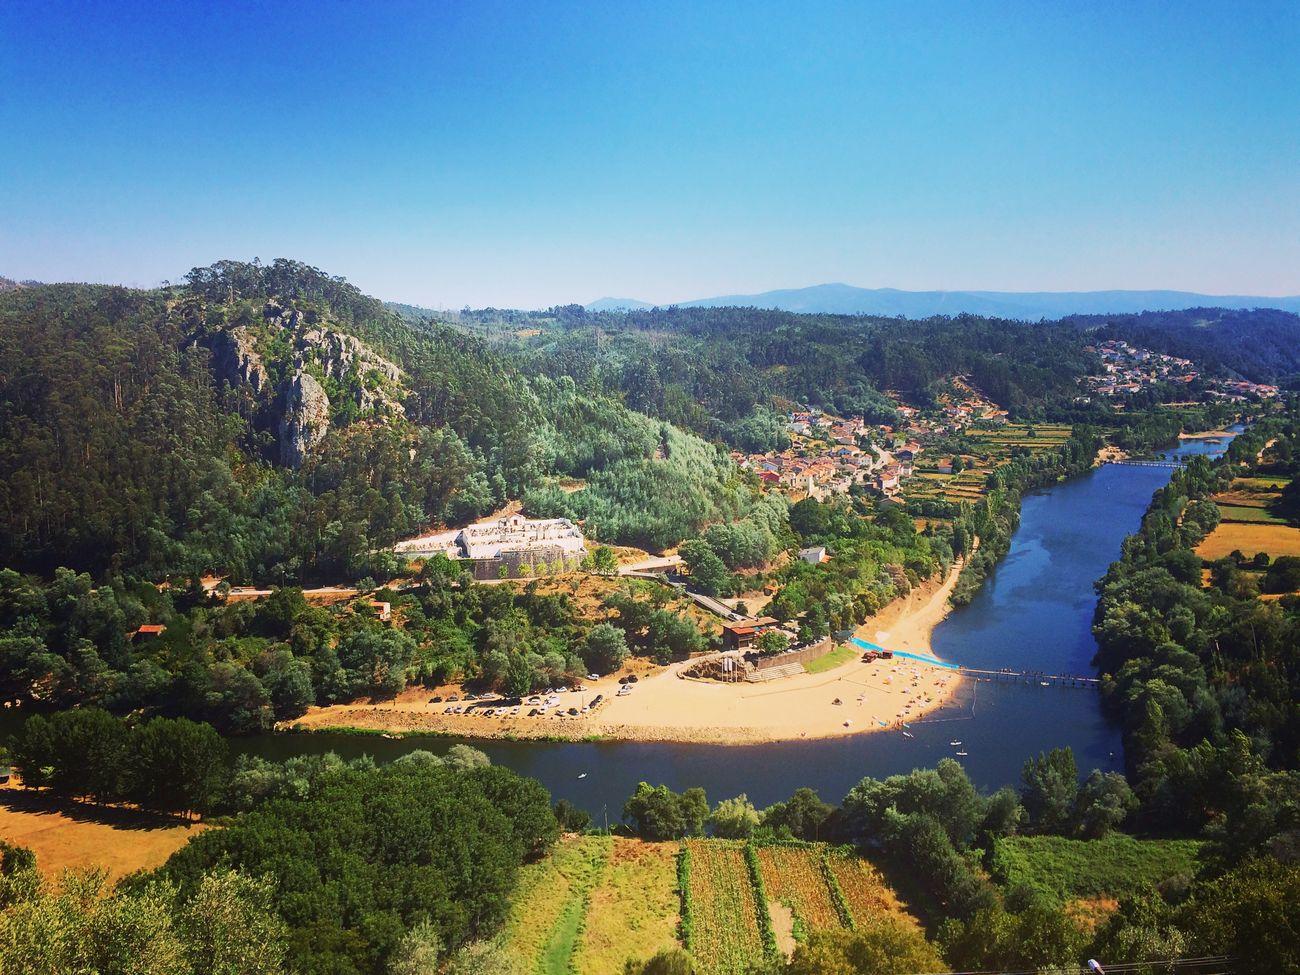 Penacova Paisagem Landscape Photorv Mondego